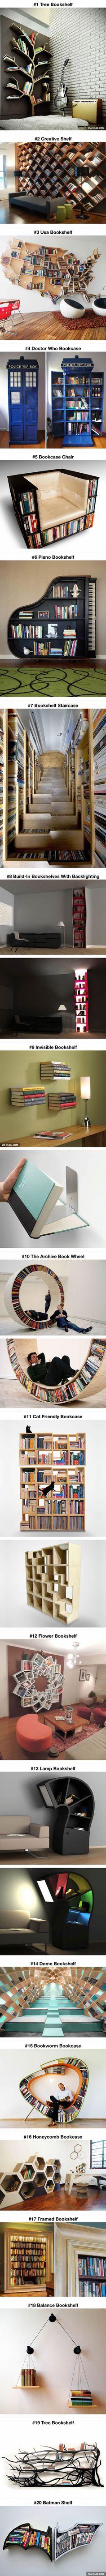 20 Most Creative Bookshelves Ever - 9GAG